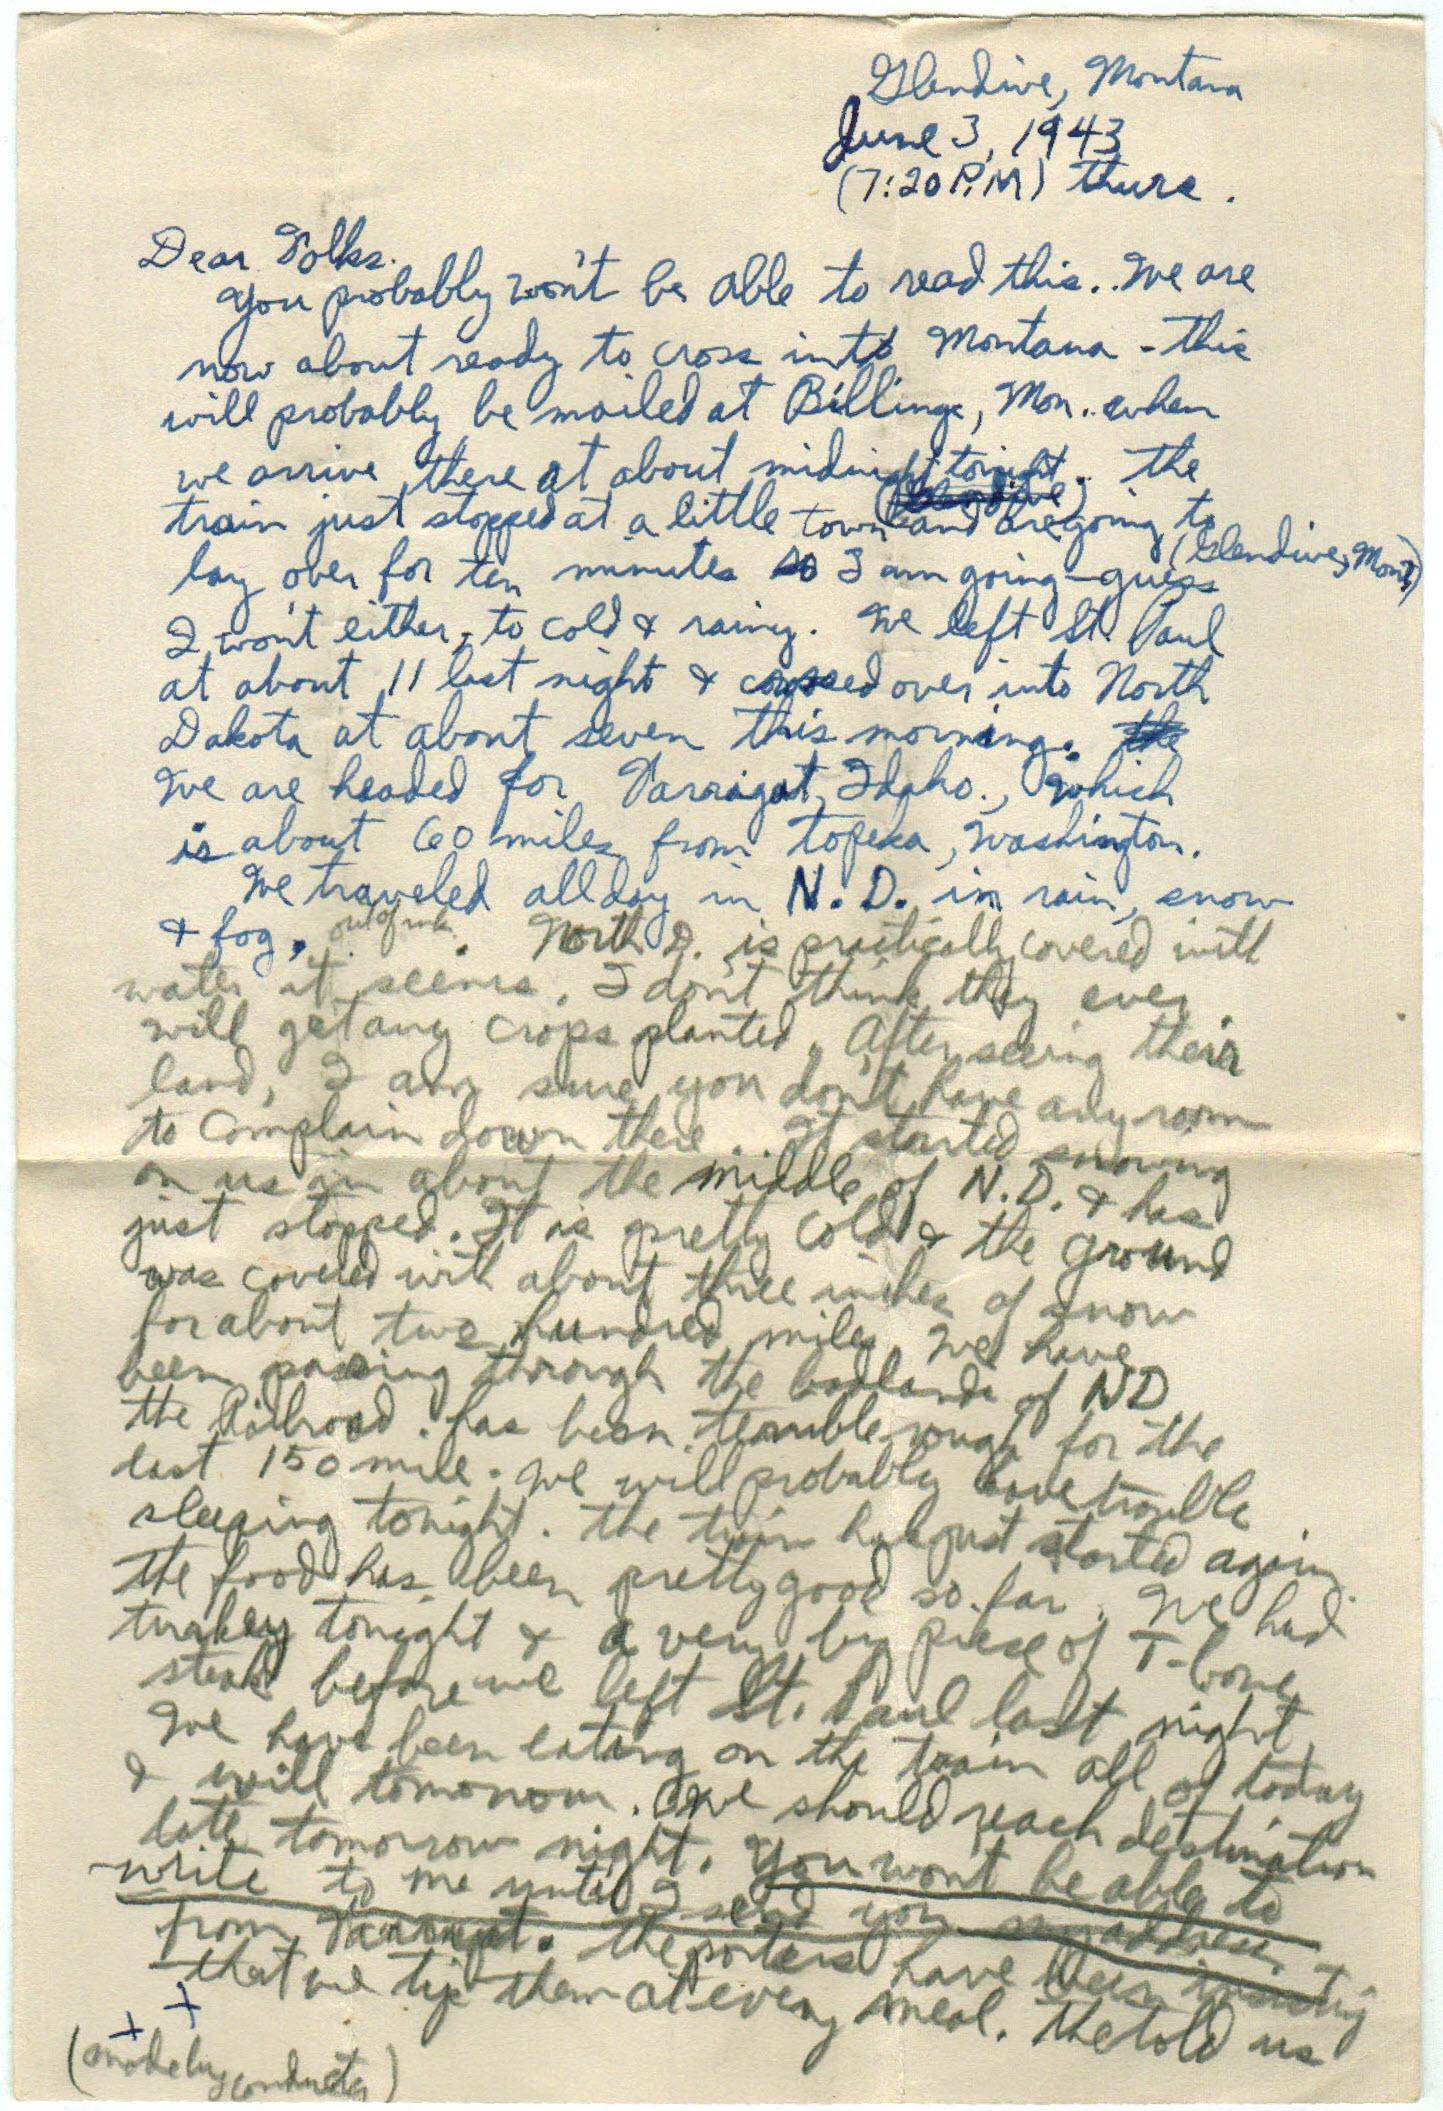 US Navy WWII Farragut, ID LSE letters – Elwald